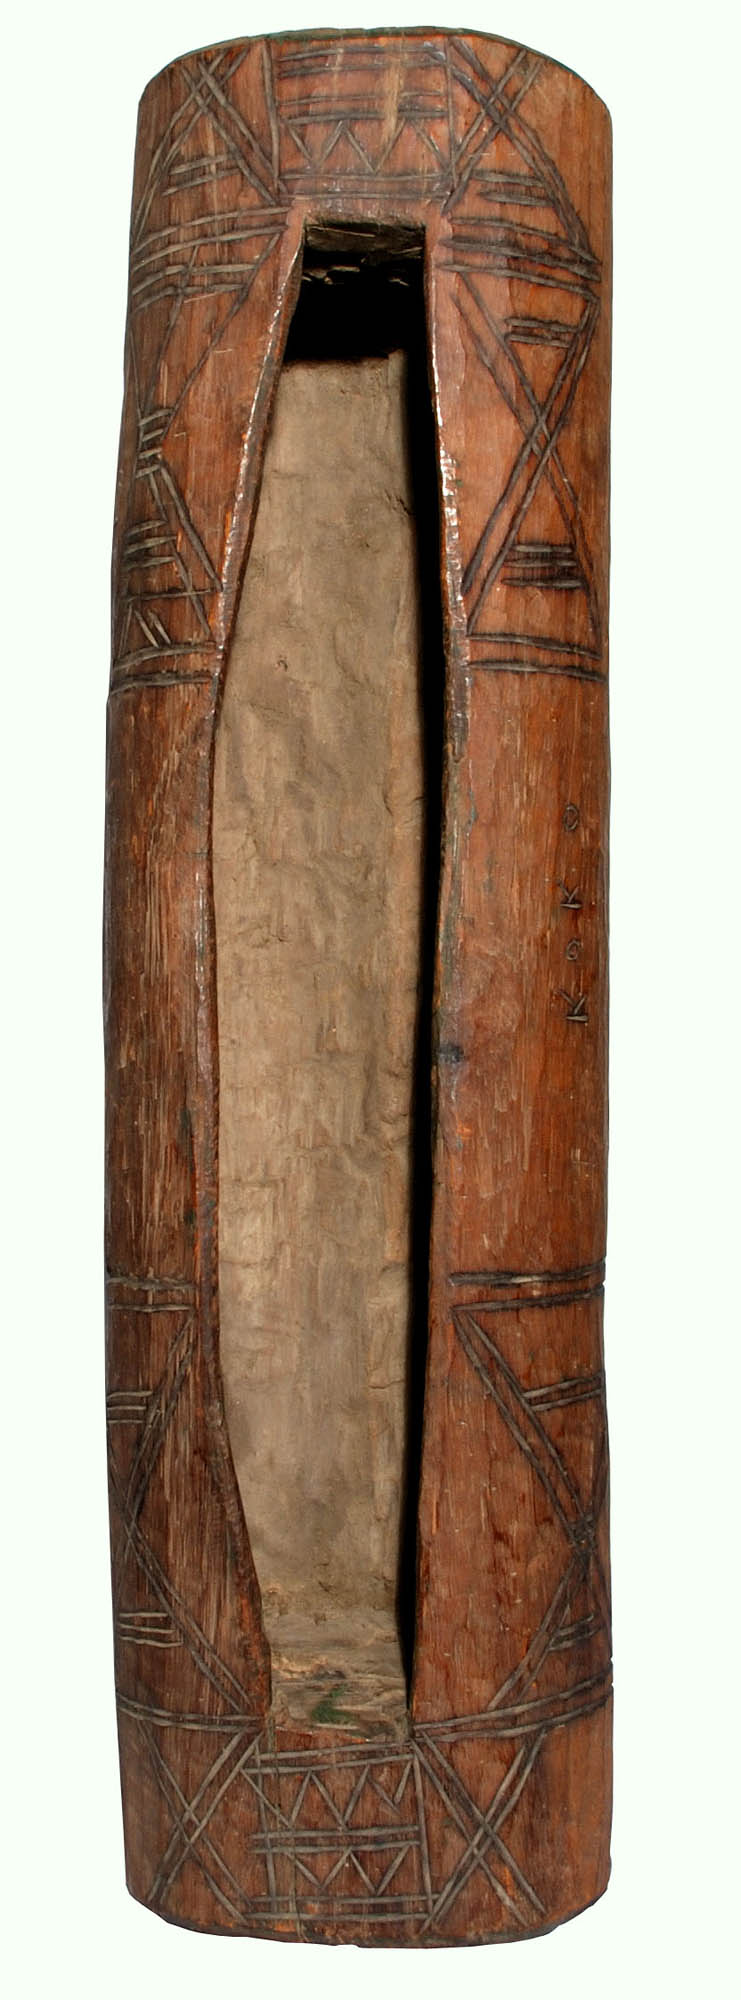 Wooden slit gong